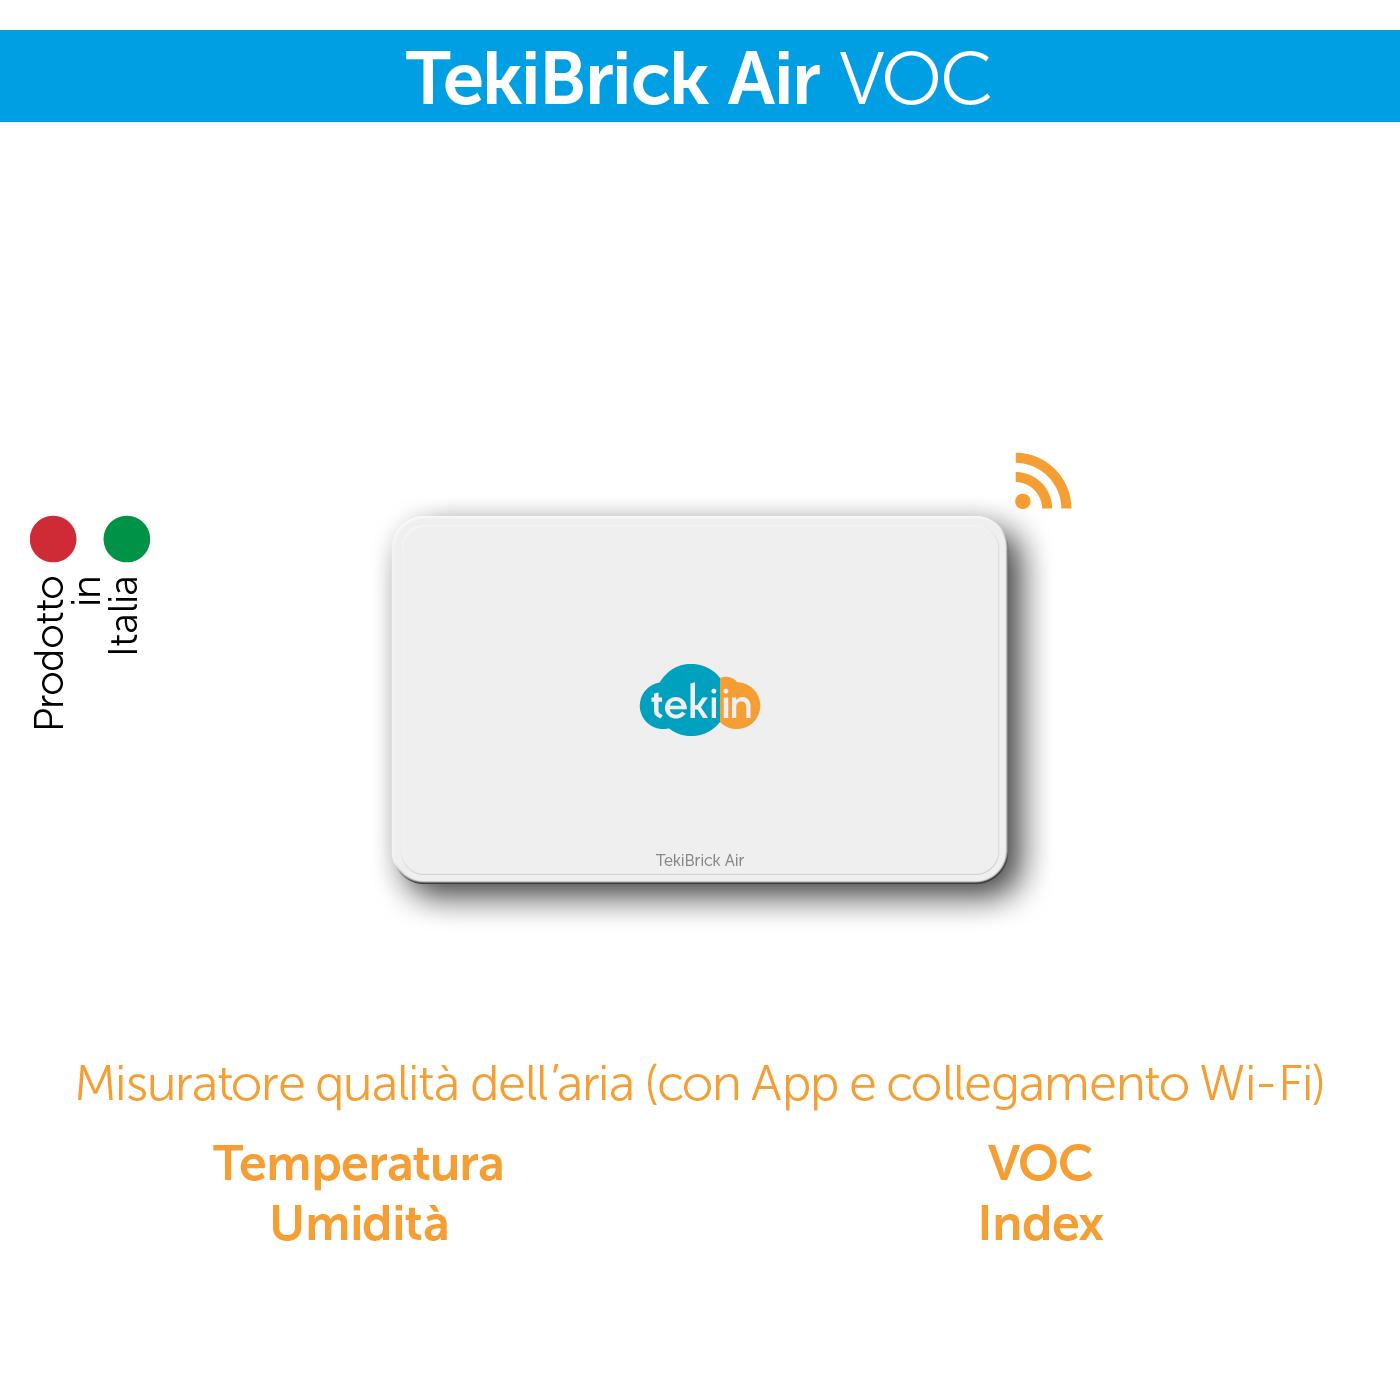 TekiBrick Air VOC